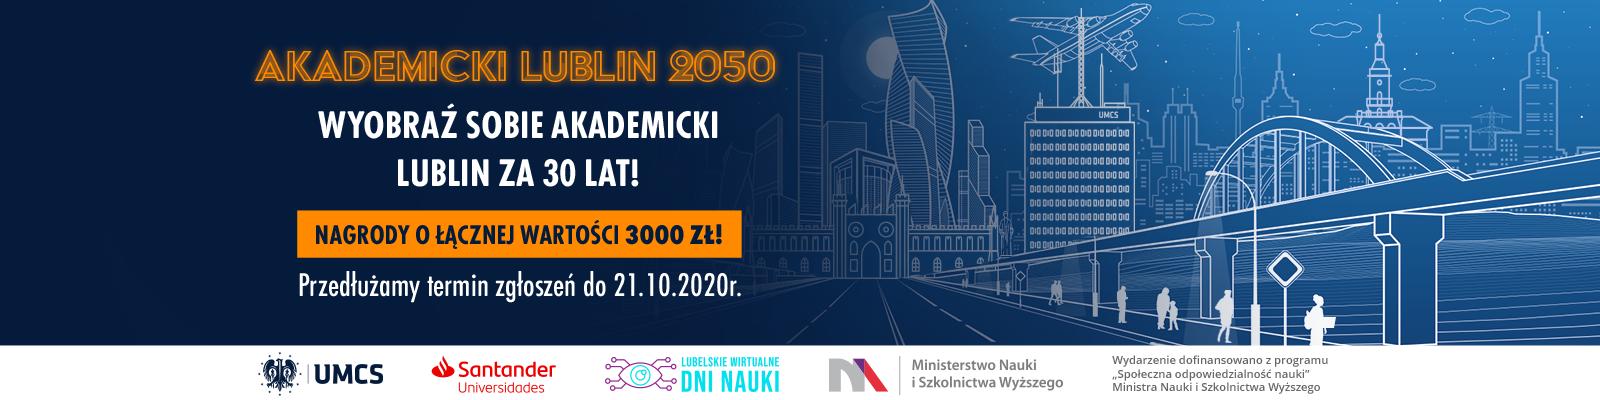 "Konkurs ""Akademicki Lublin 2050"""